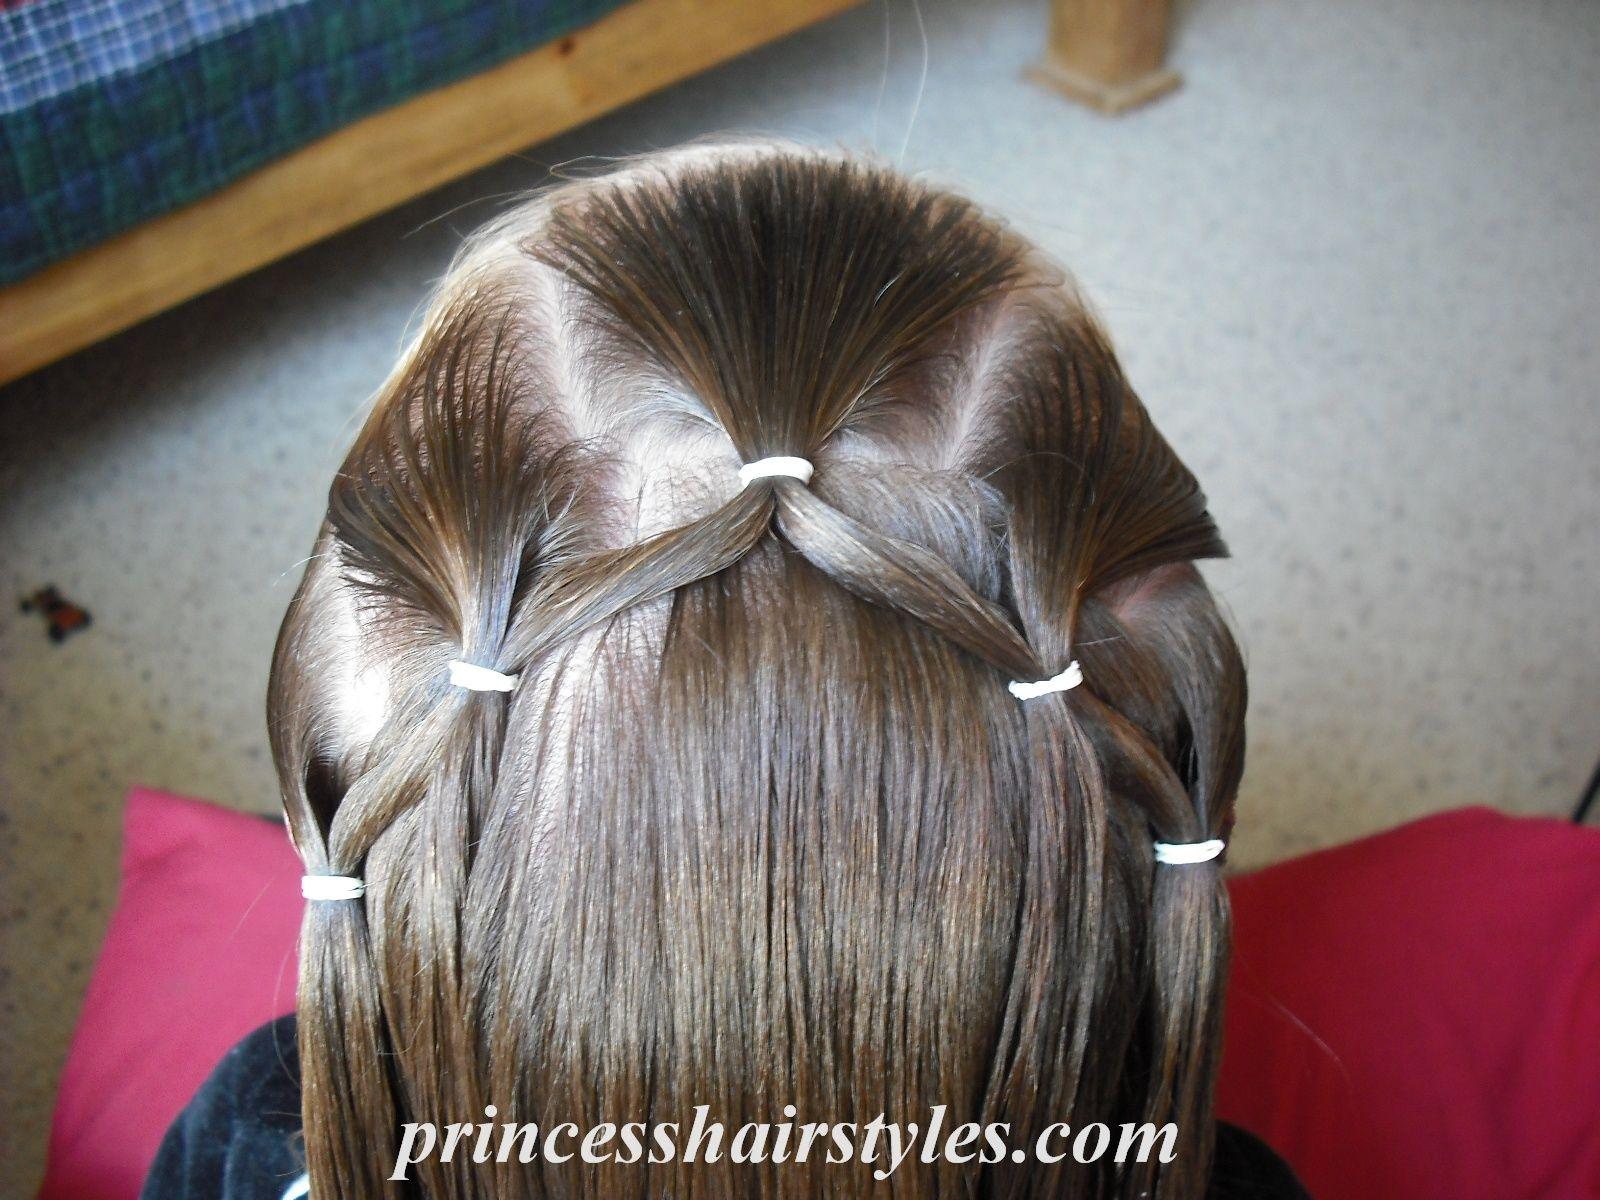 Winding snake braid princess hairstyles girl hair and hair style